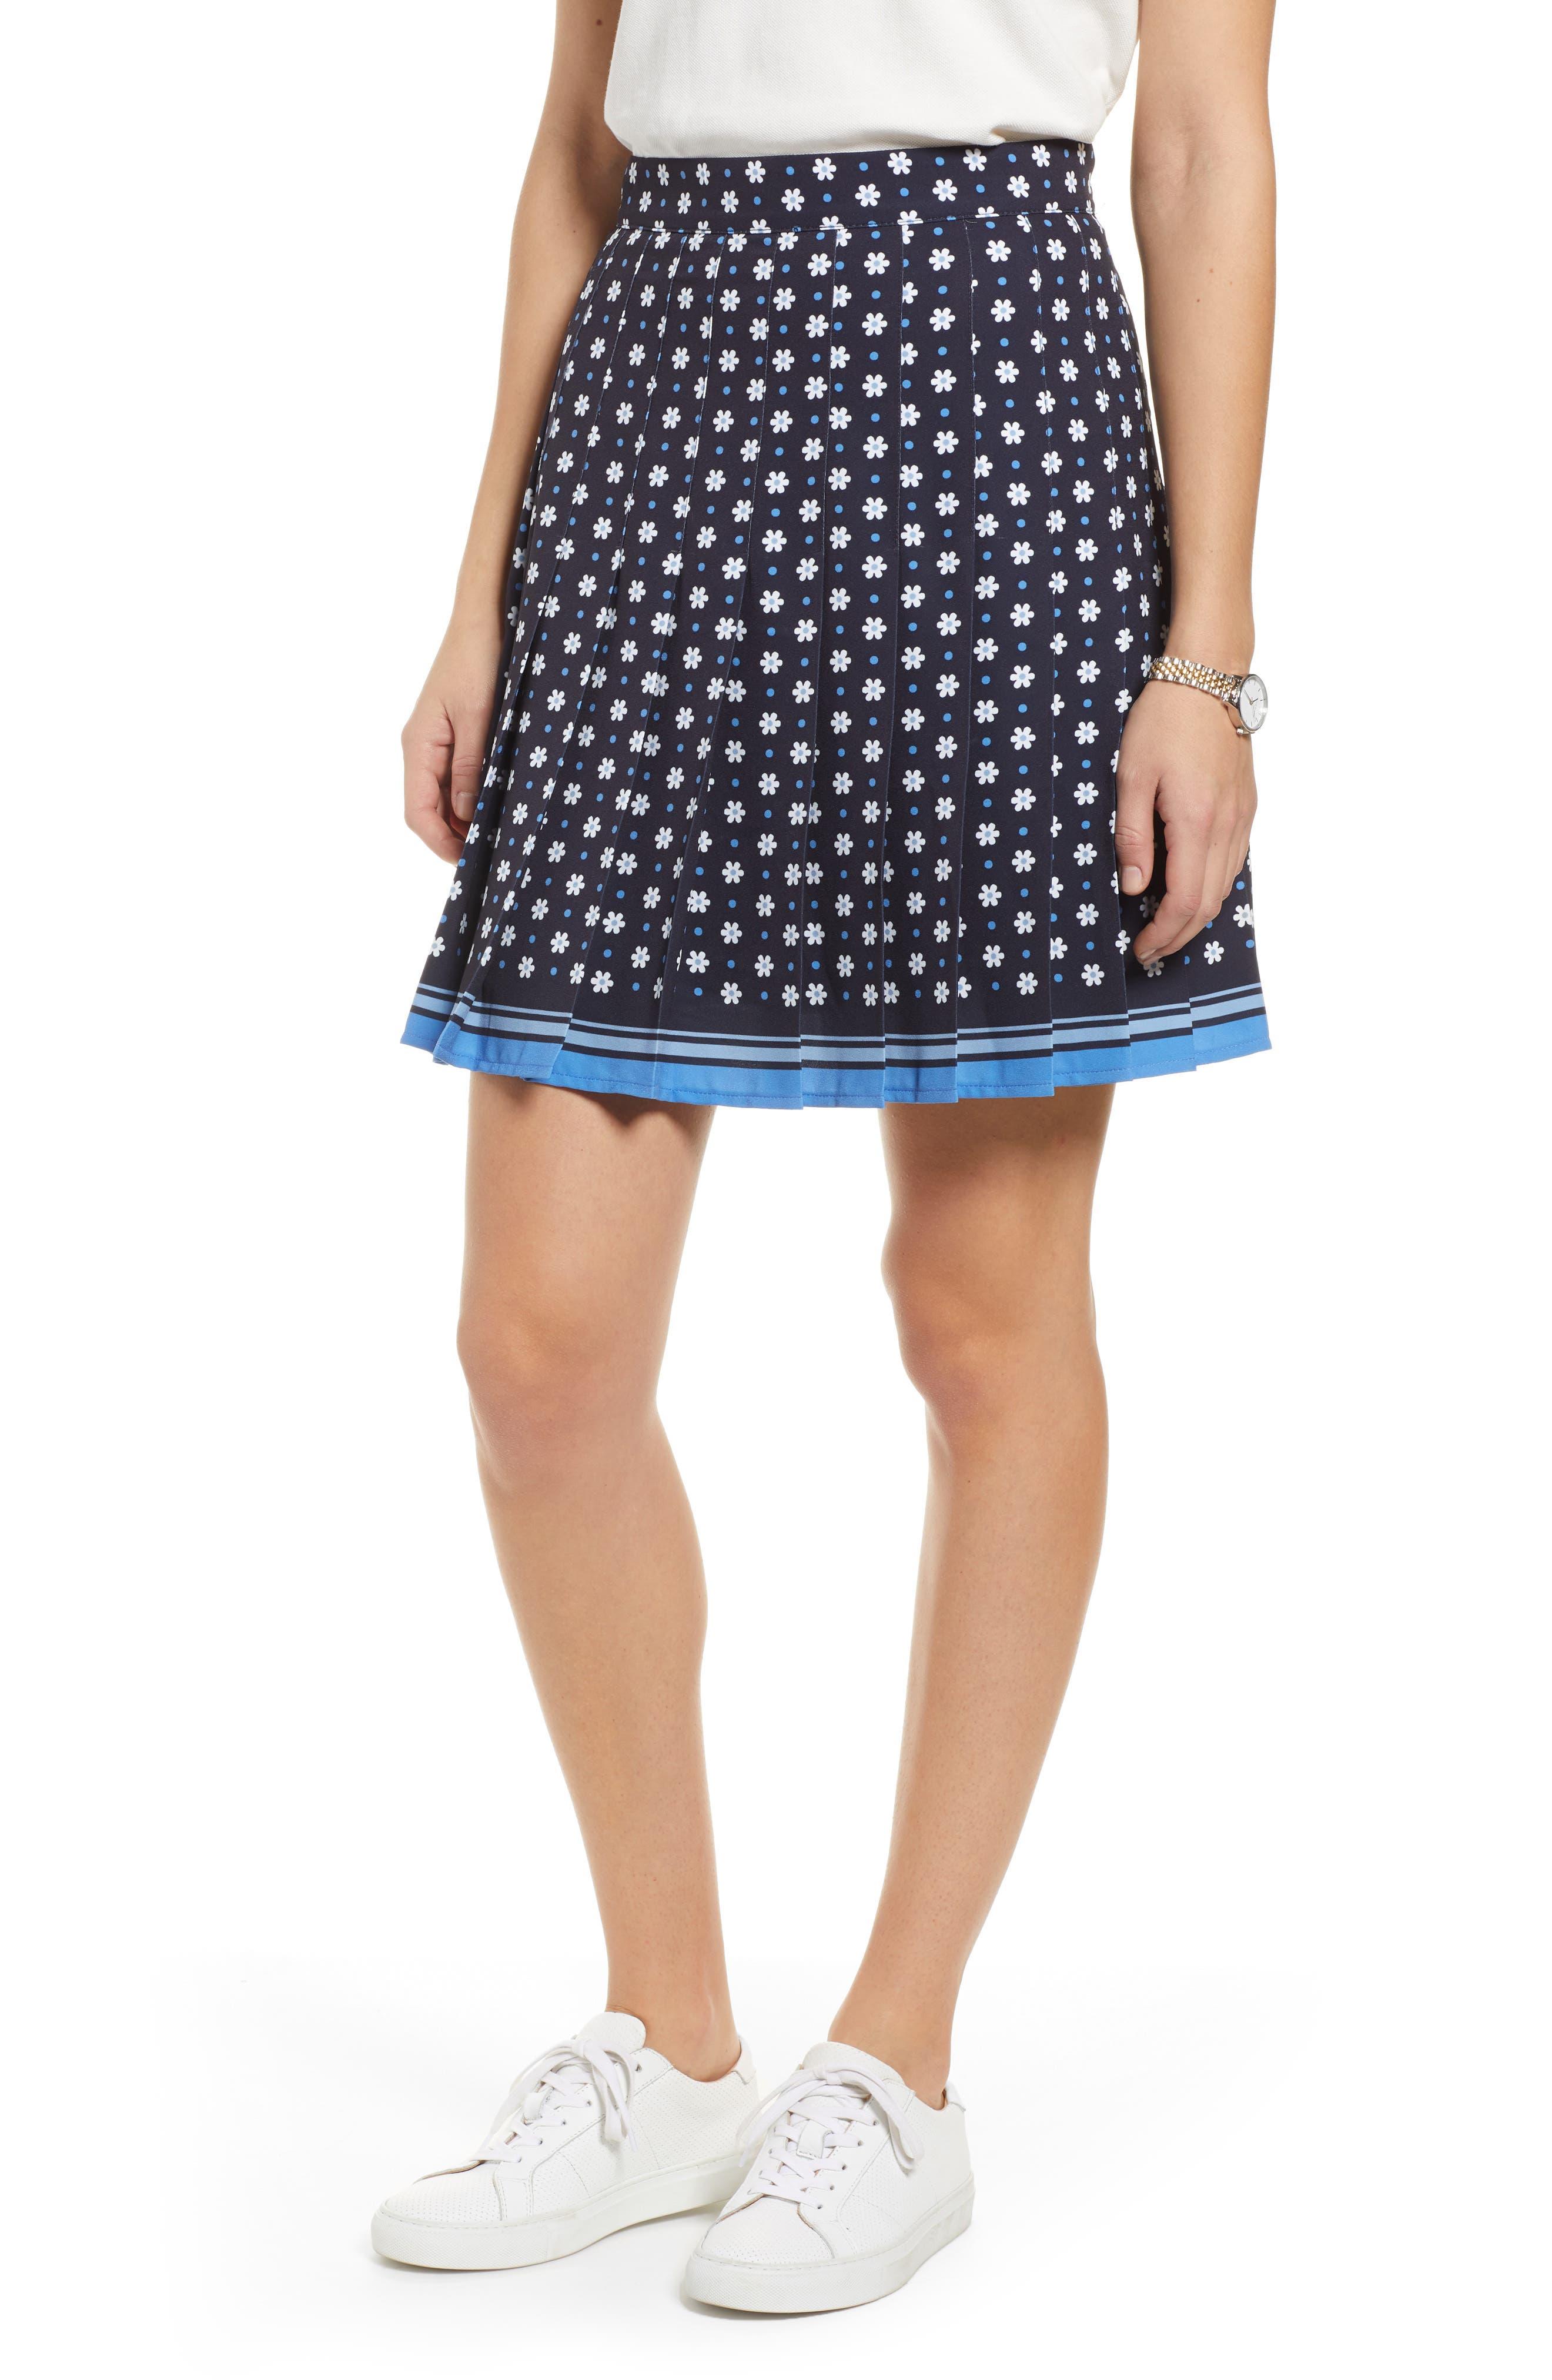 1901 Pleated Tennis Skirt, Main, color, NAVY NIGHT DAISY DOT